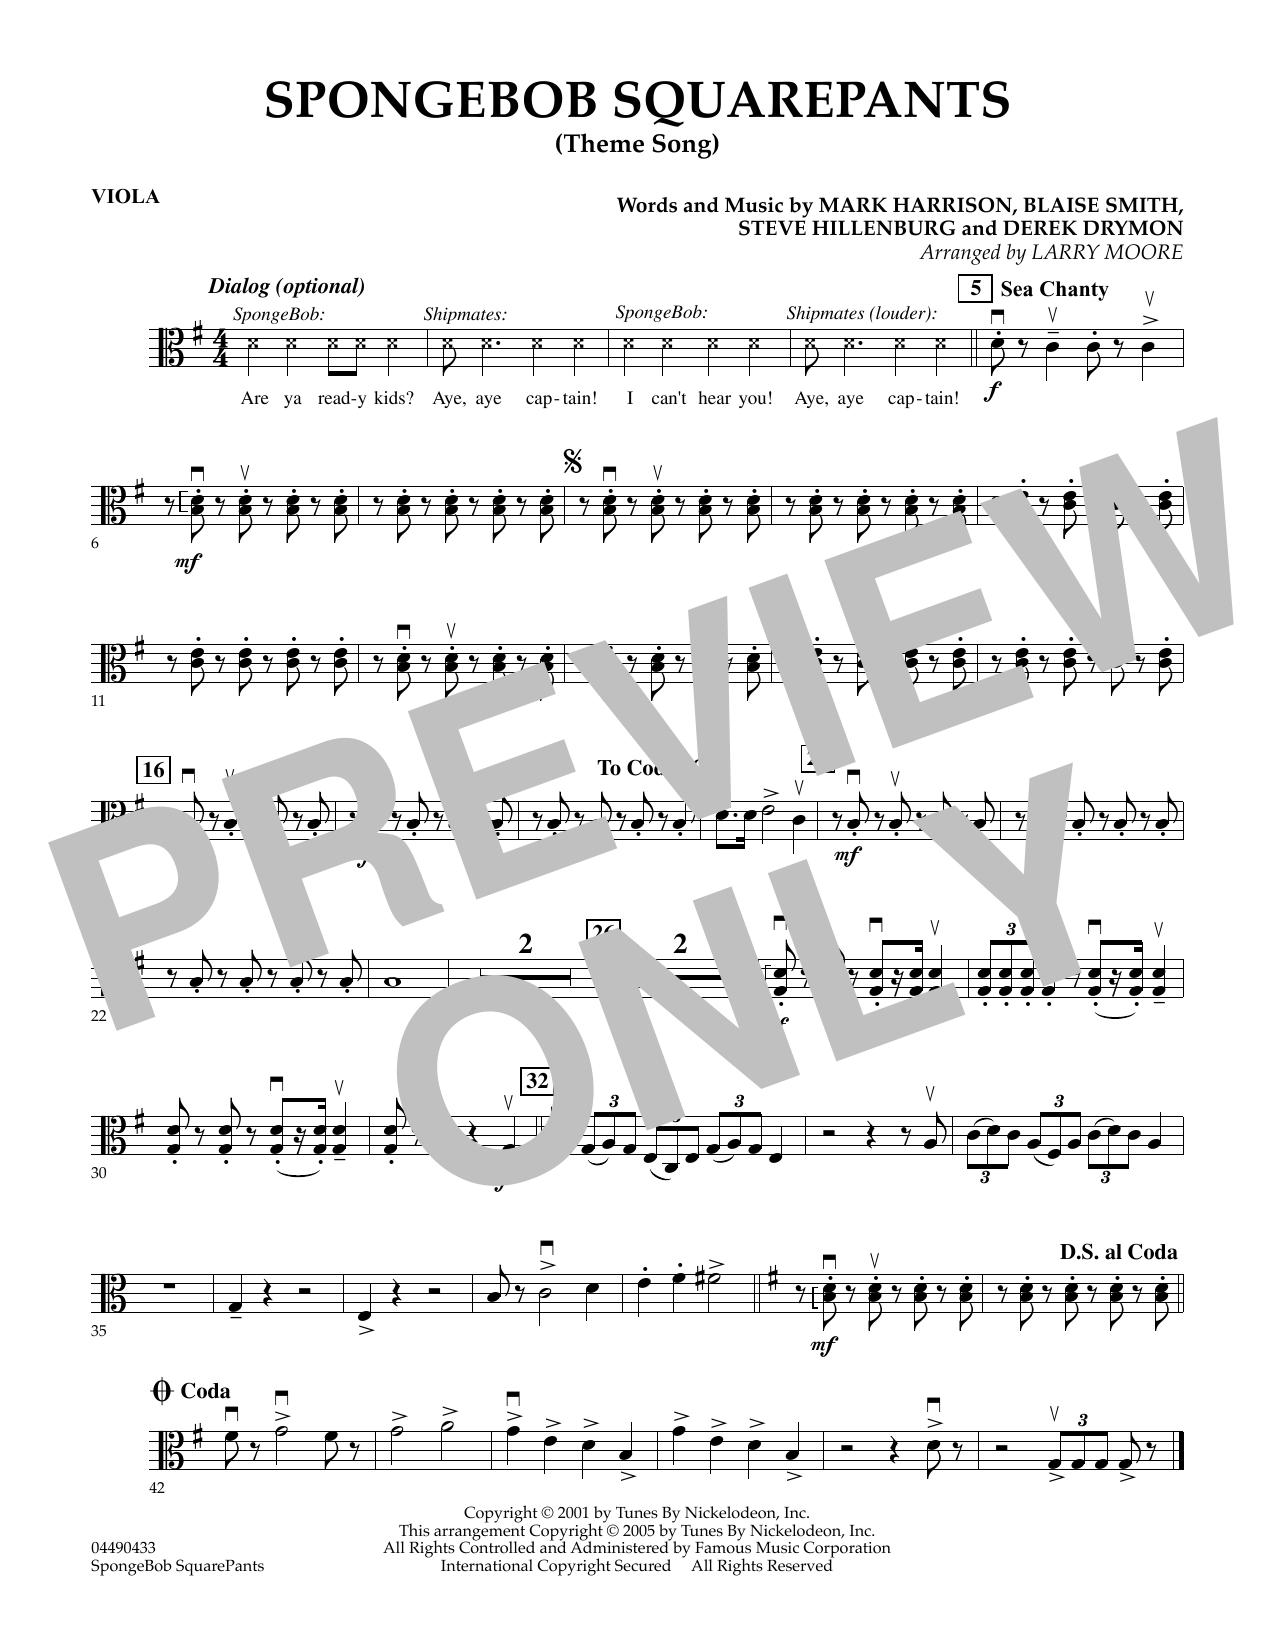 SpongeBob SquarePants (Theme Song) - Viola by Larry Moore Orchestra Digital  Sheet Music